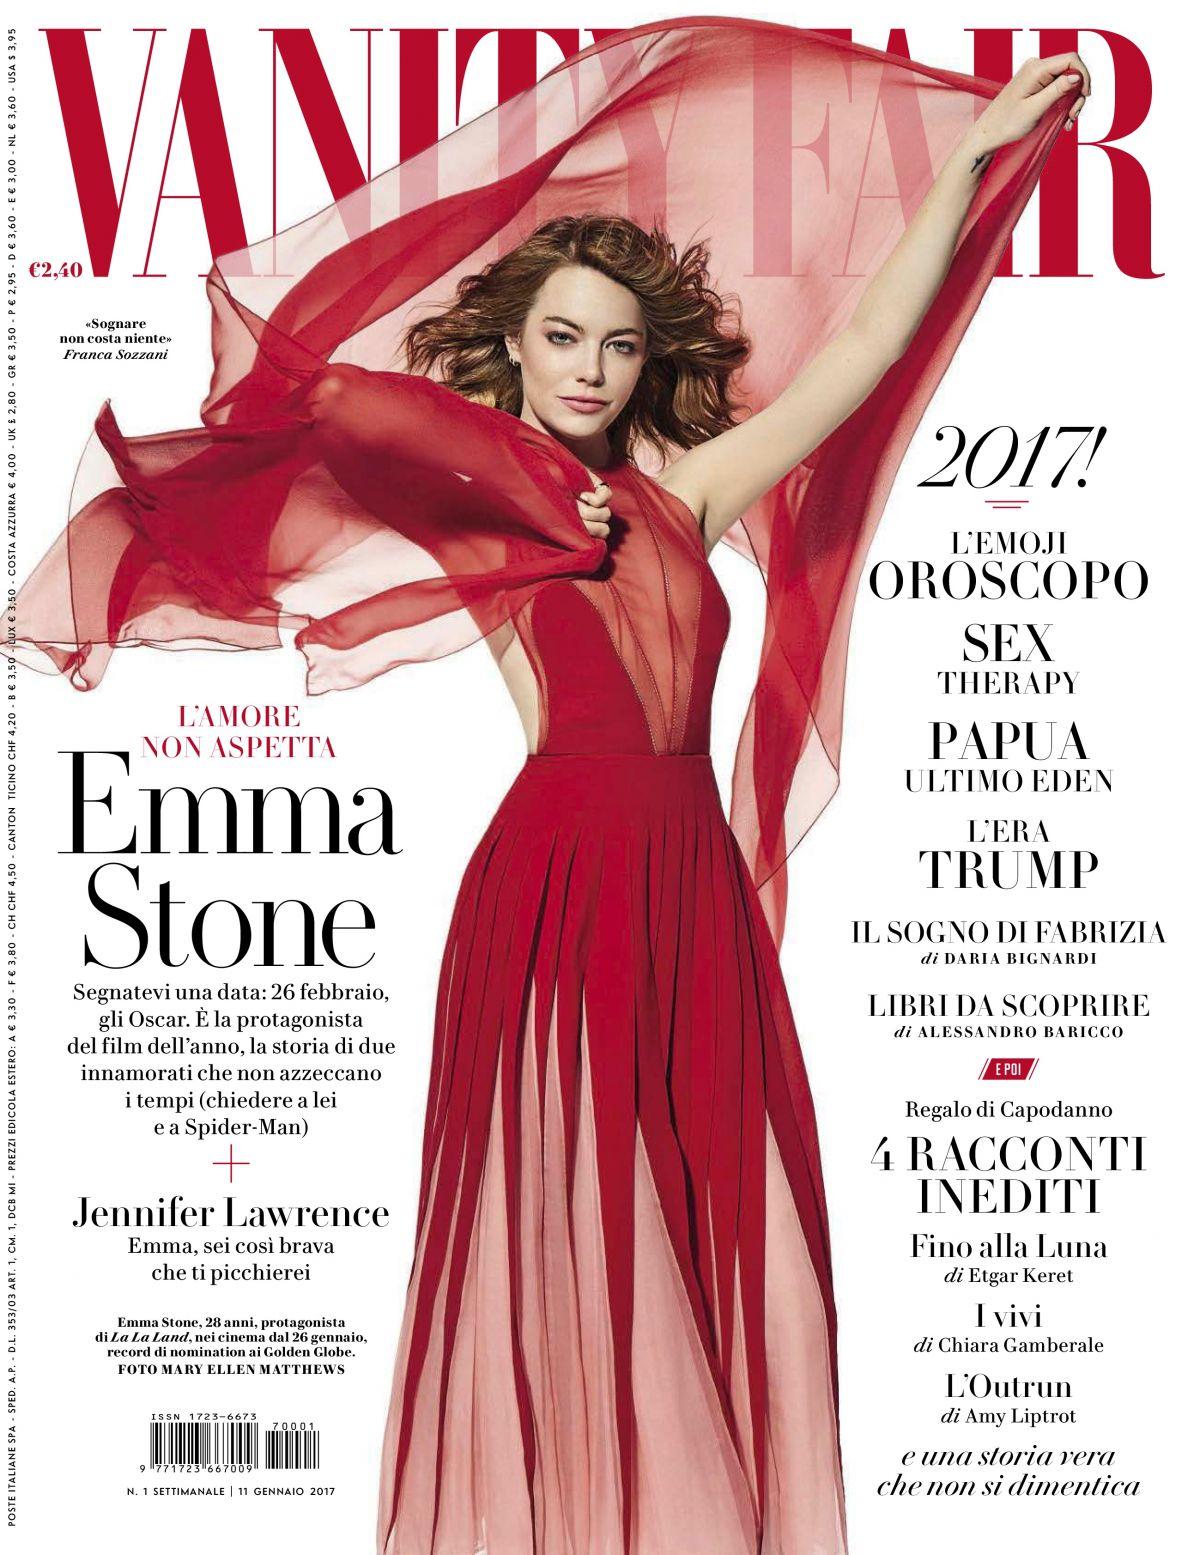 Vanity Fair Magazine May 2015 #657 Sofia Loren